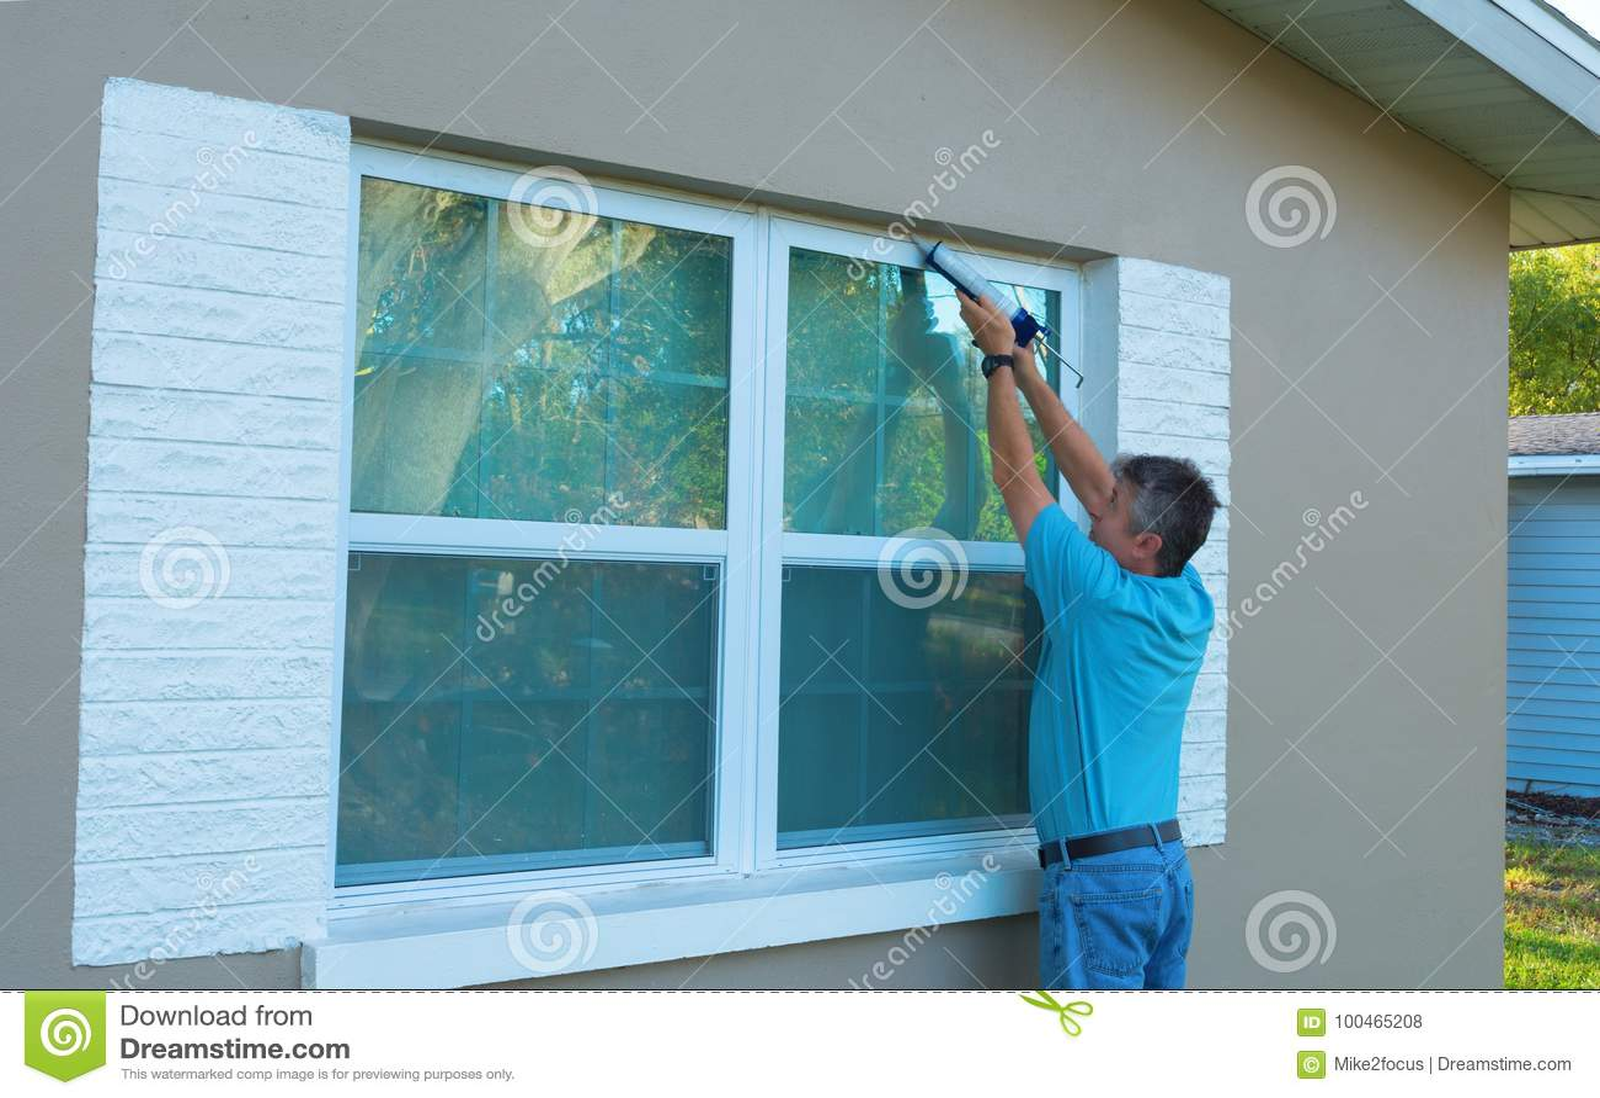 Homeowner caulking window weatherproofing home against rain and storms